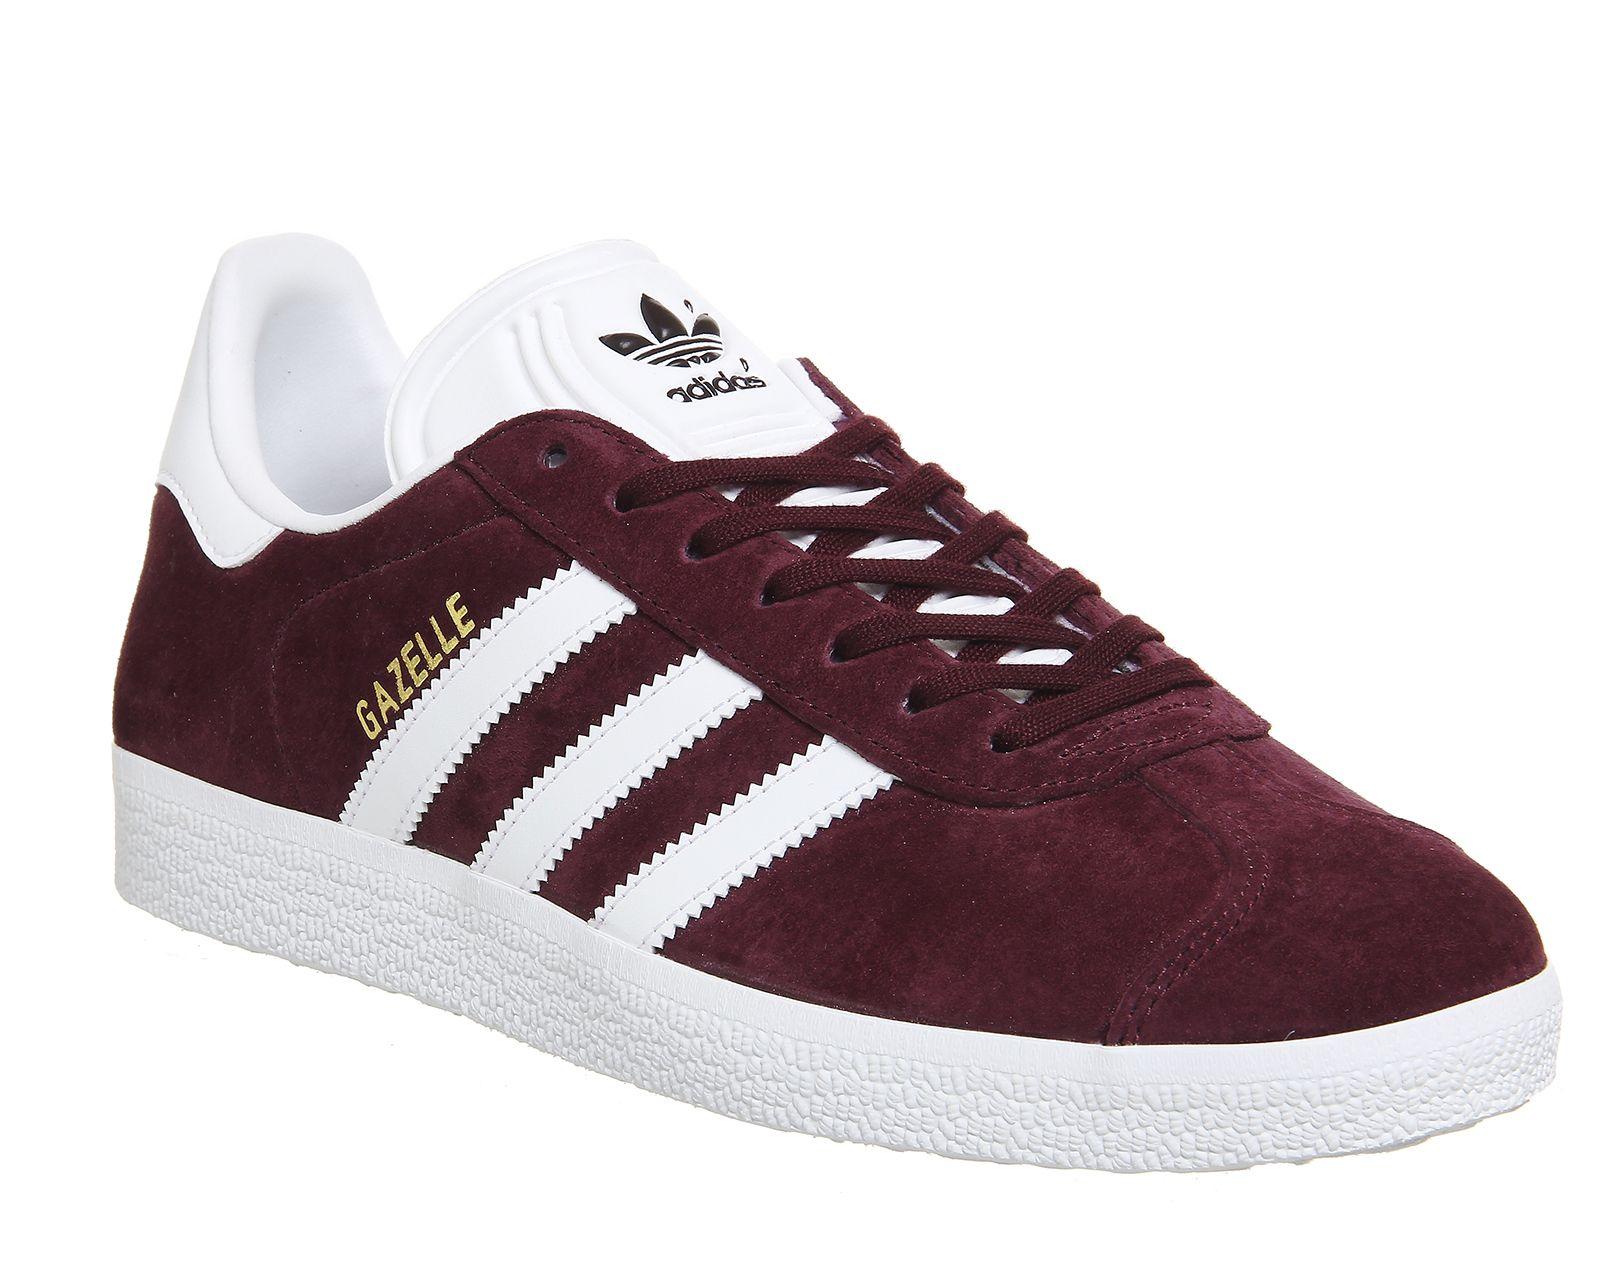 Gazelle Trainers   Adidas gazelle, Burgundy sneakers, Metallic ...